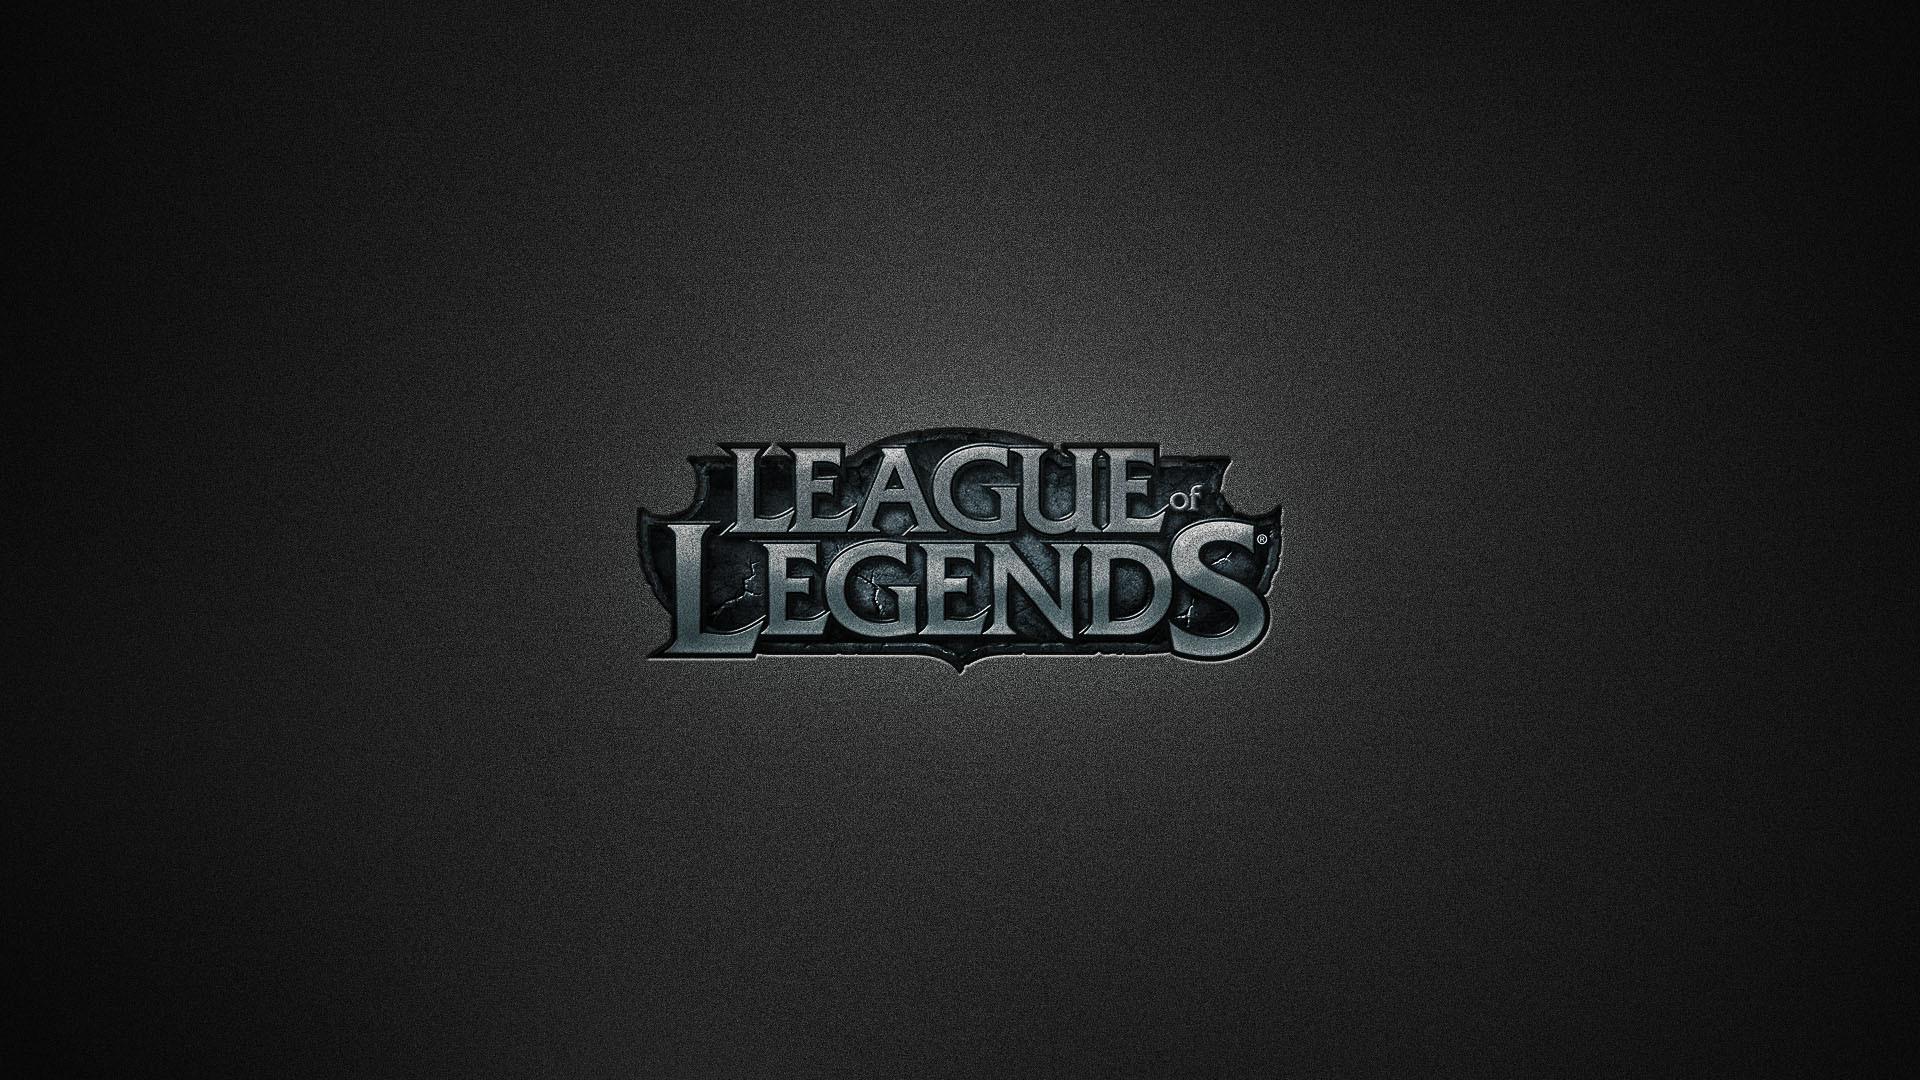 League of Legends Logo Brushed HD Wallpaper. »